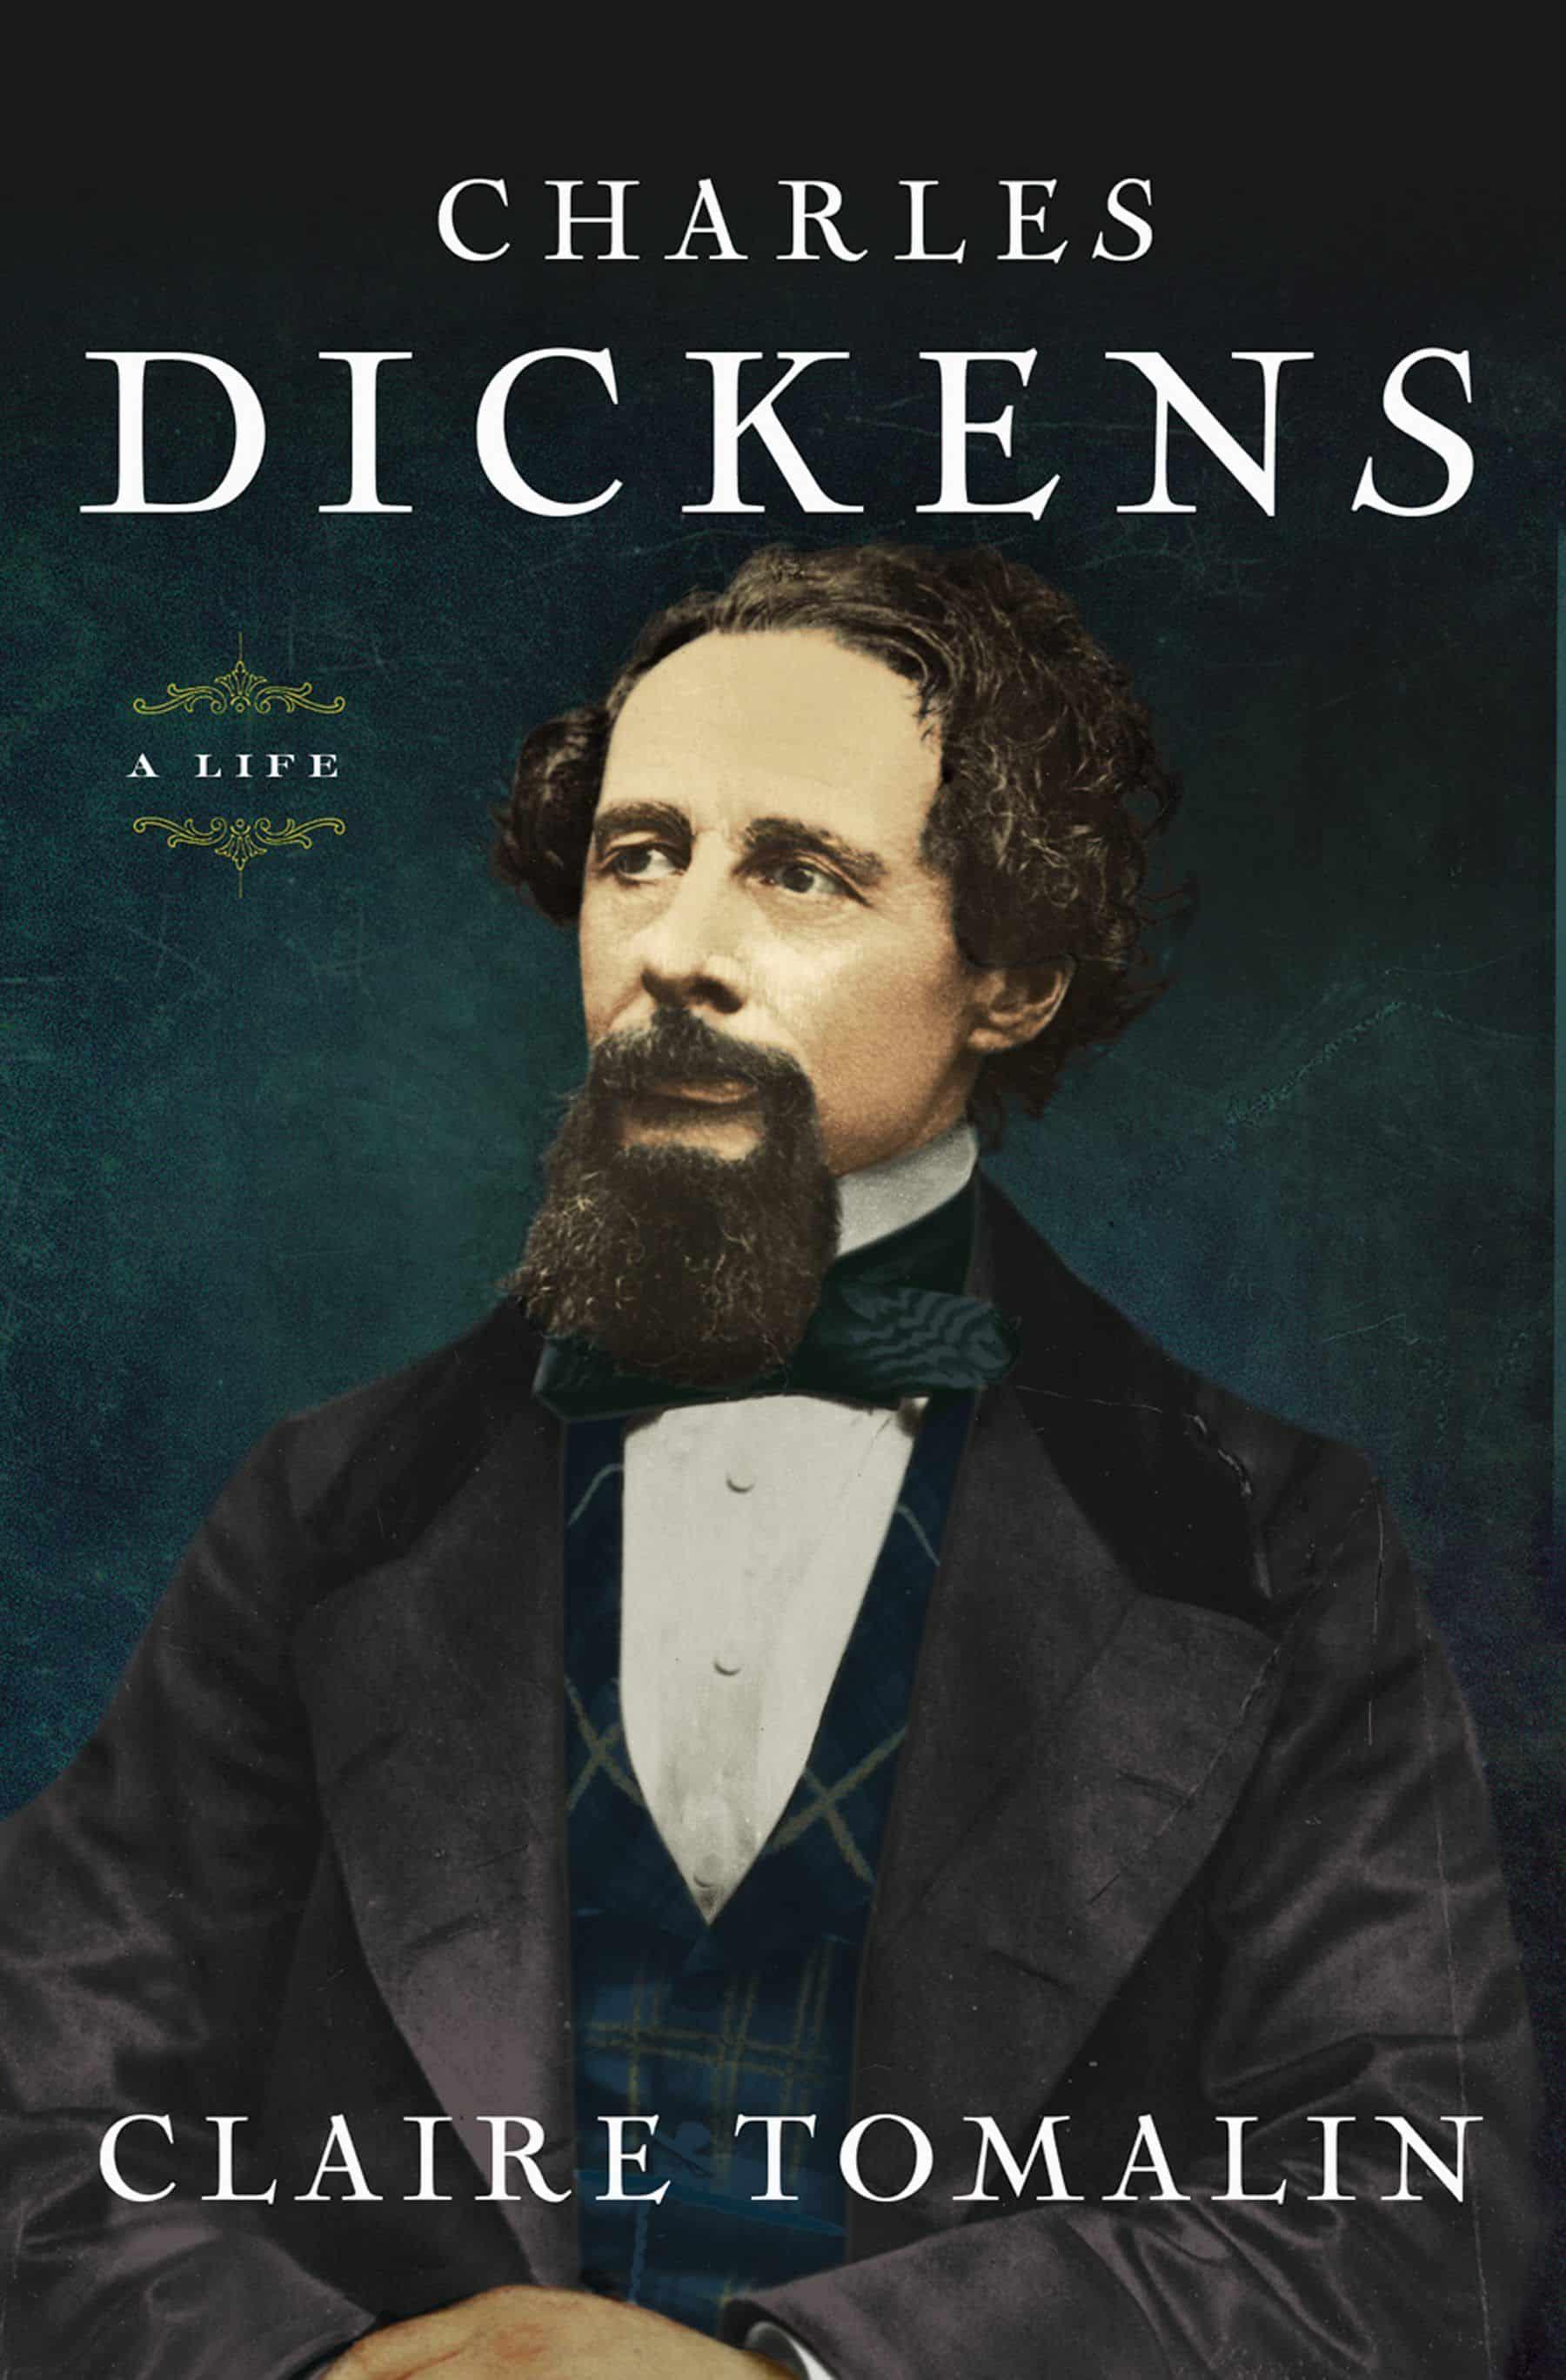 Charles Dickens A Life - Charles Dickens: A Life